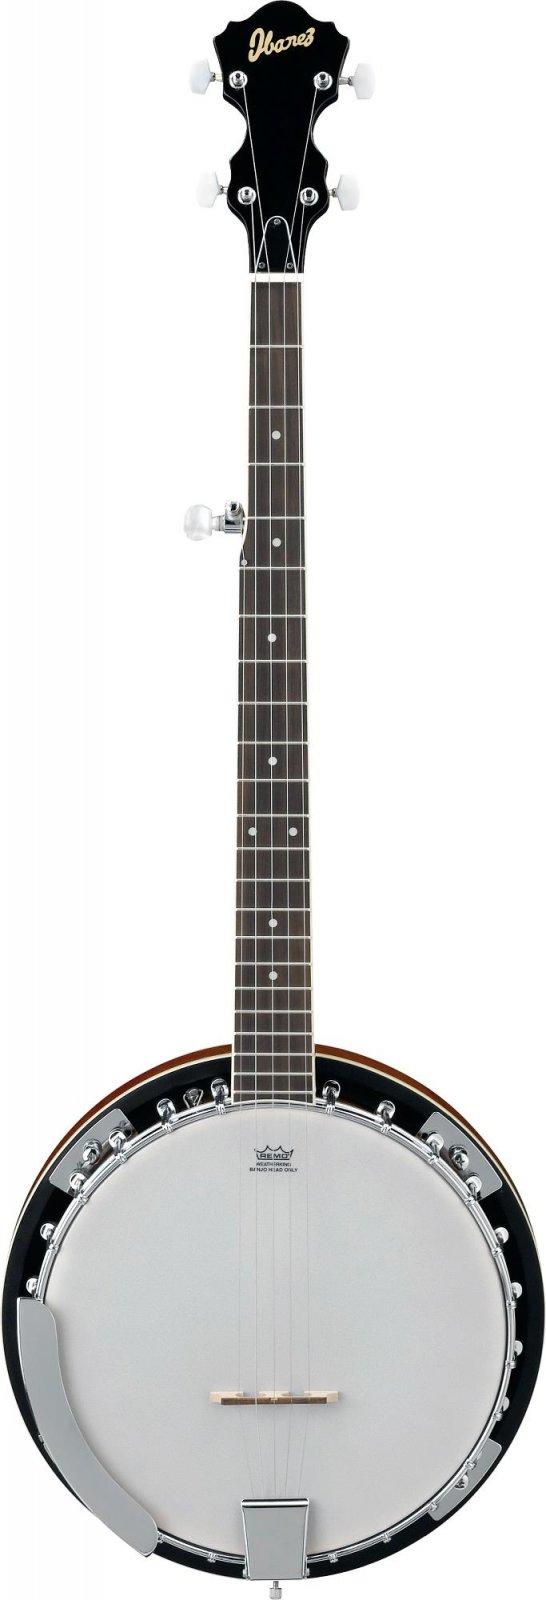 Ibanez B50 5 String Closed Back/Resonator Banjo